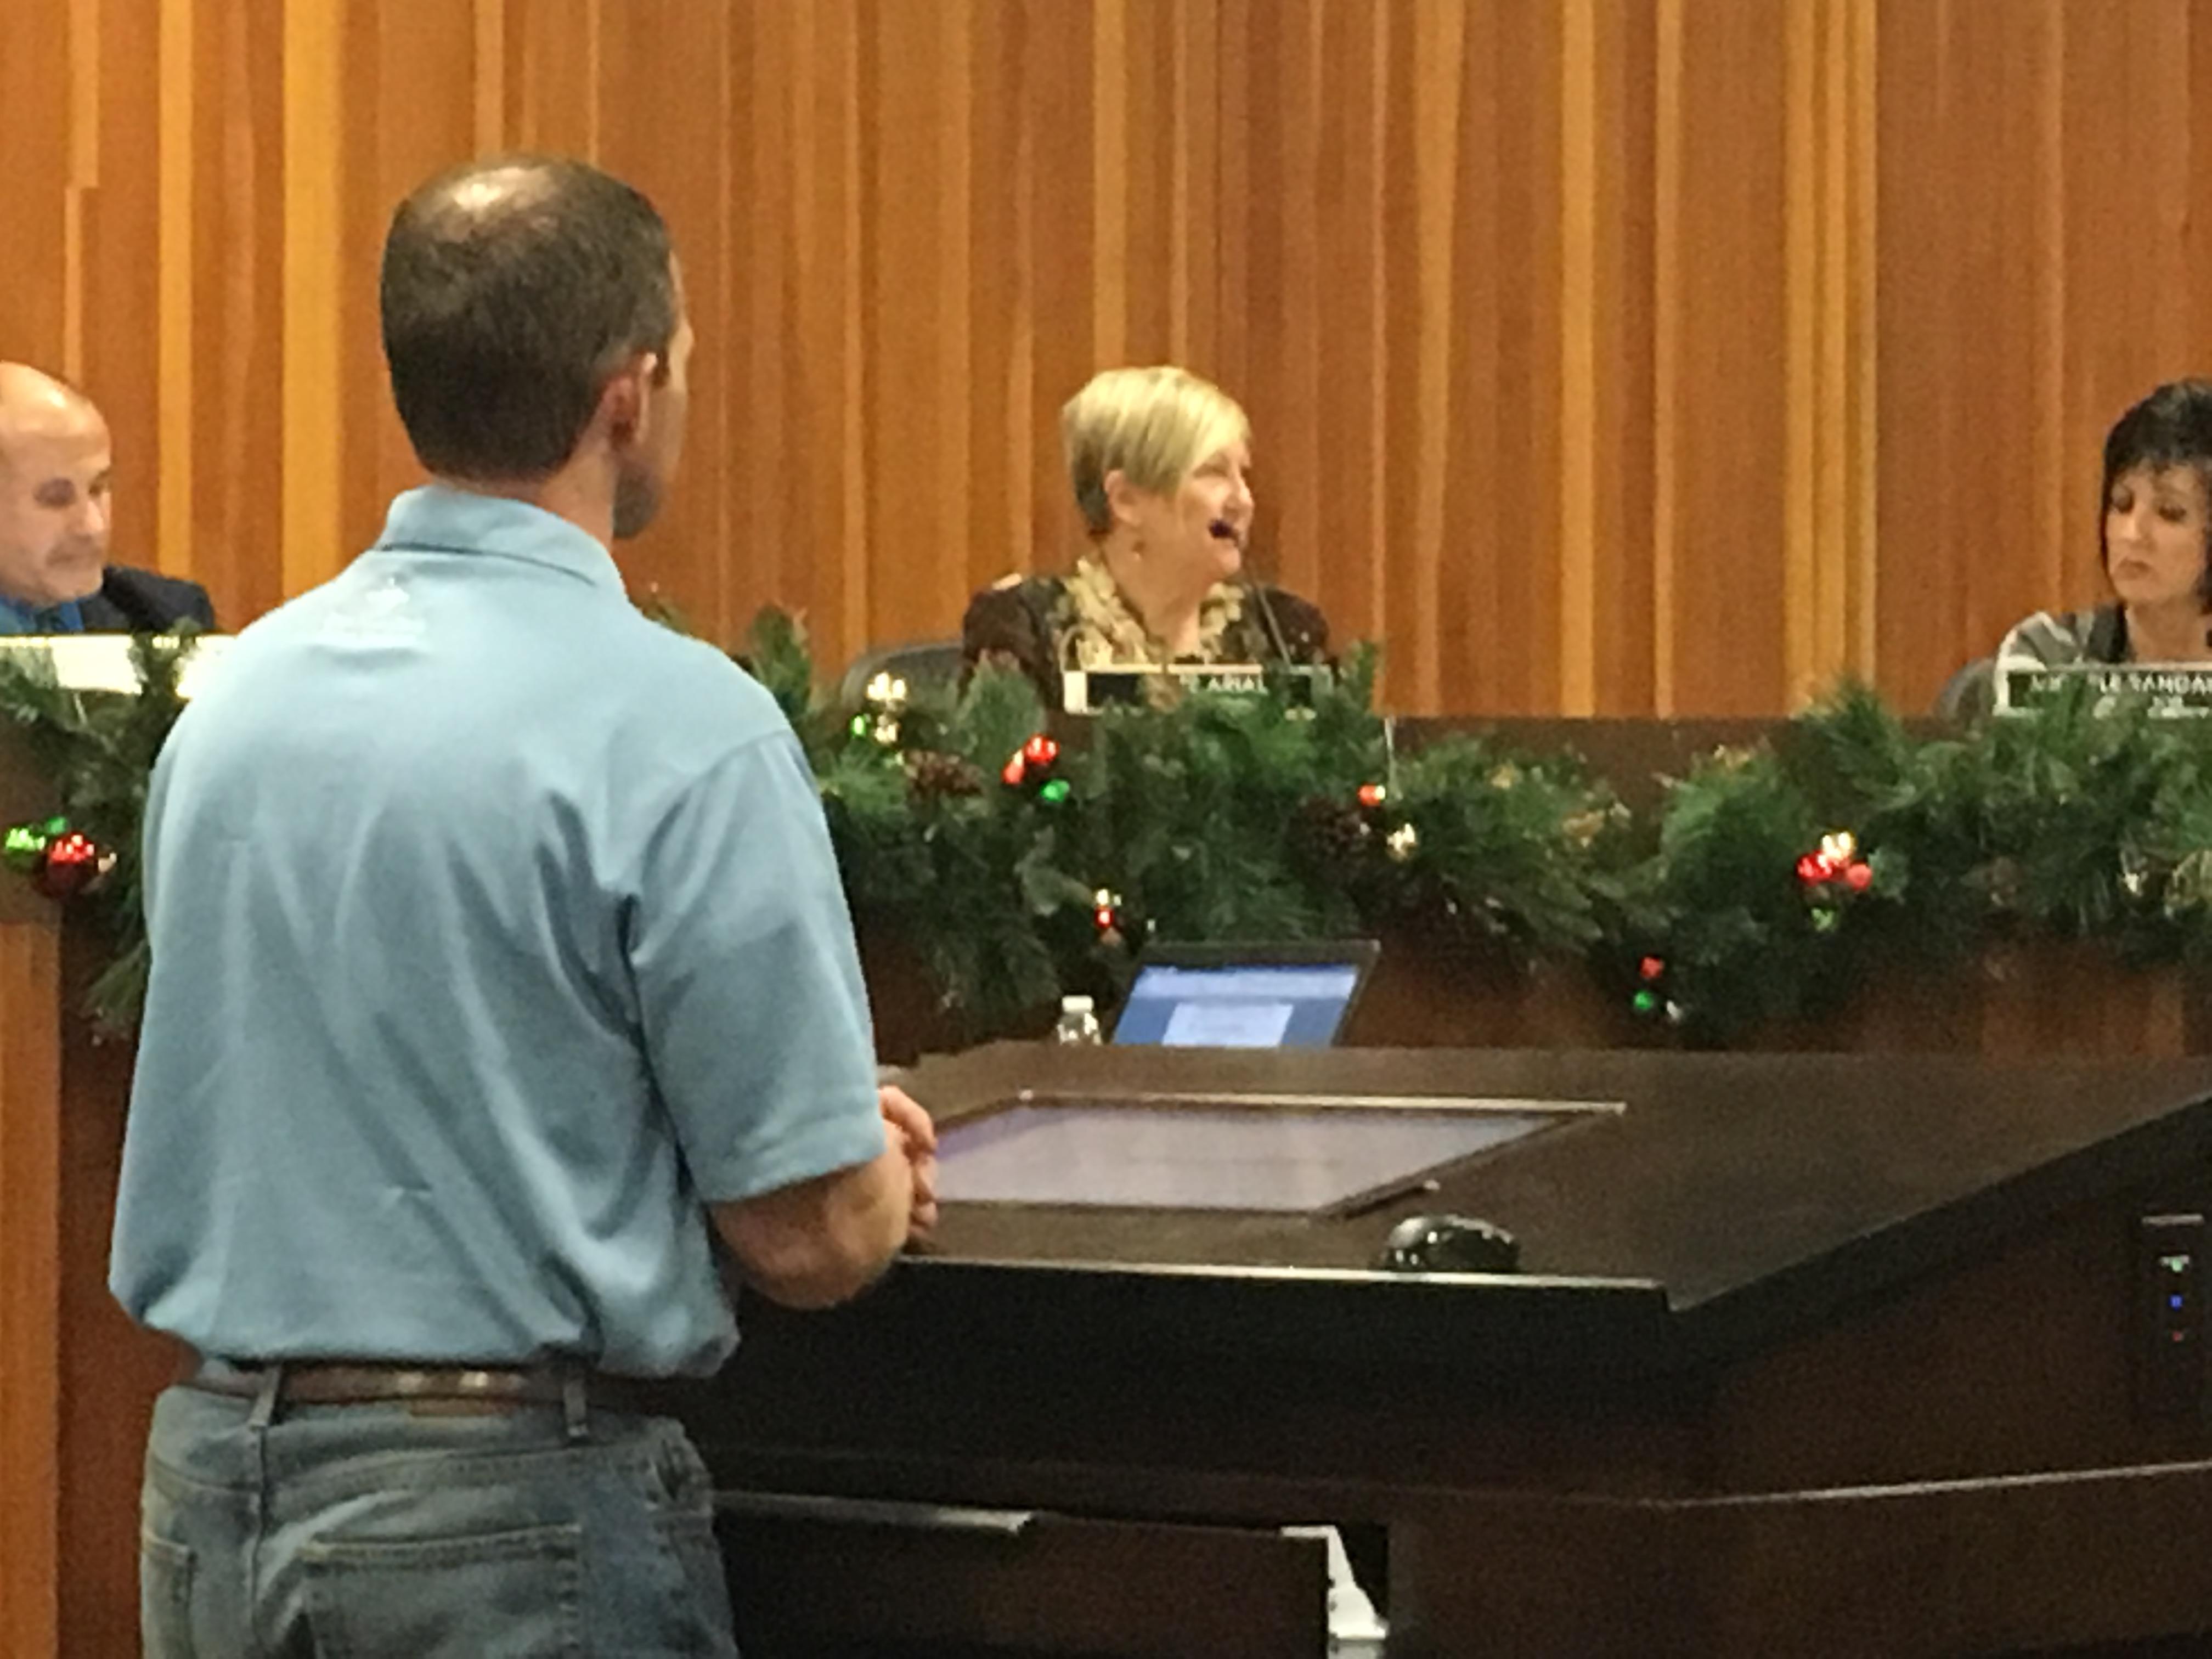 St. George City Council meeting, St. George, Utah, Dec. 3, 2015 | Photo by Tracie Sullivan, St. George News